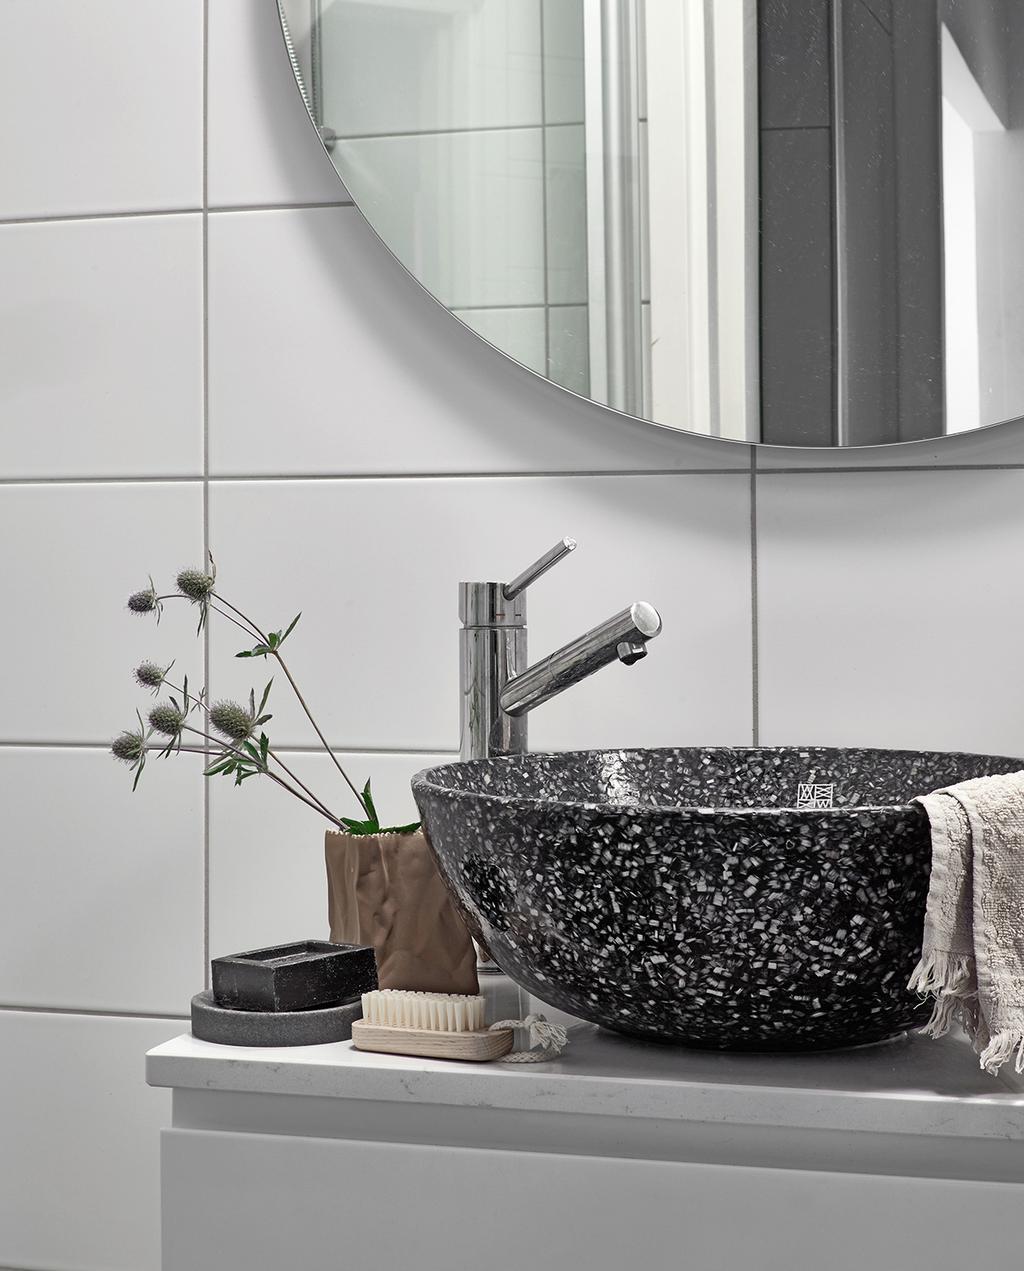 vtwonen special tiny houses |  badkamer wasbak zwart met witte stippen